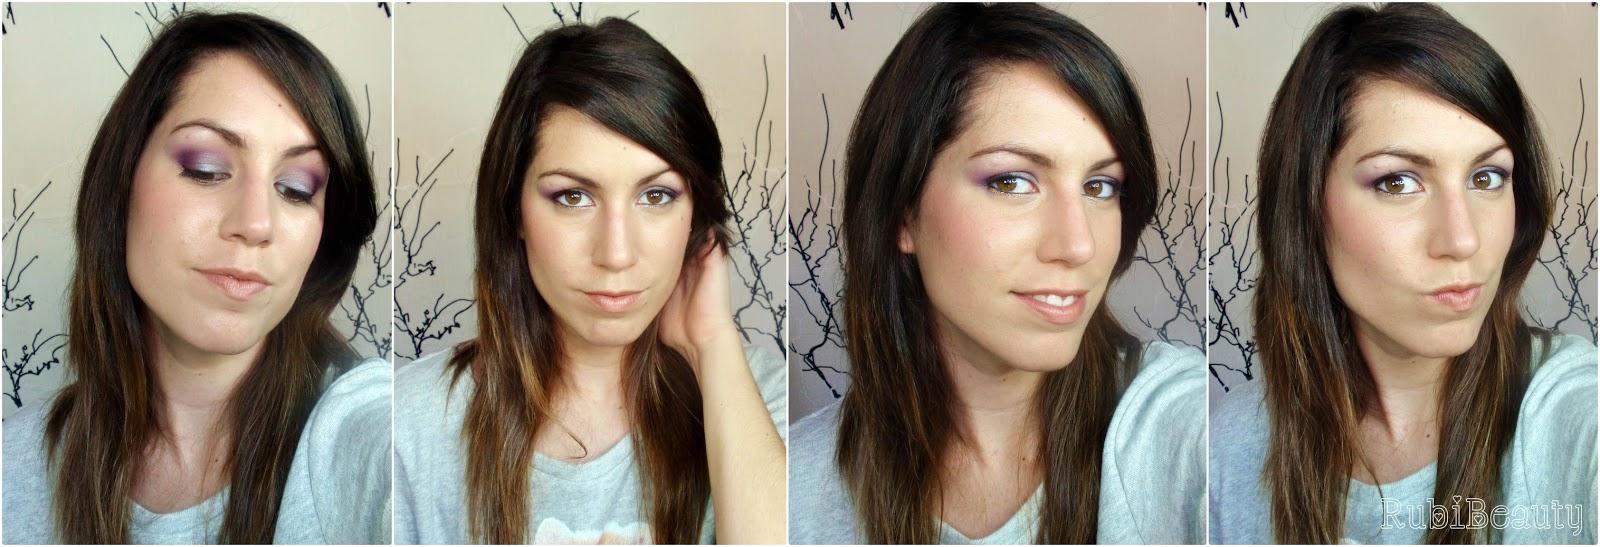 rubibeauty maquillaje look peggy sage morado fashion plum